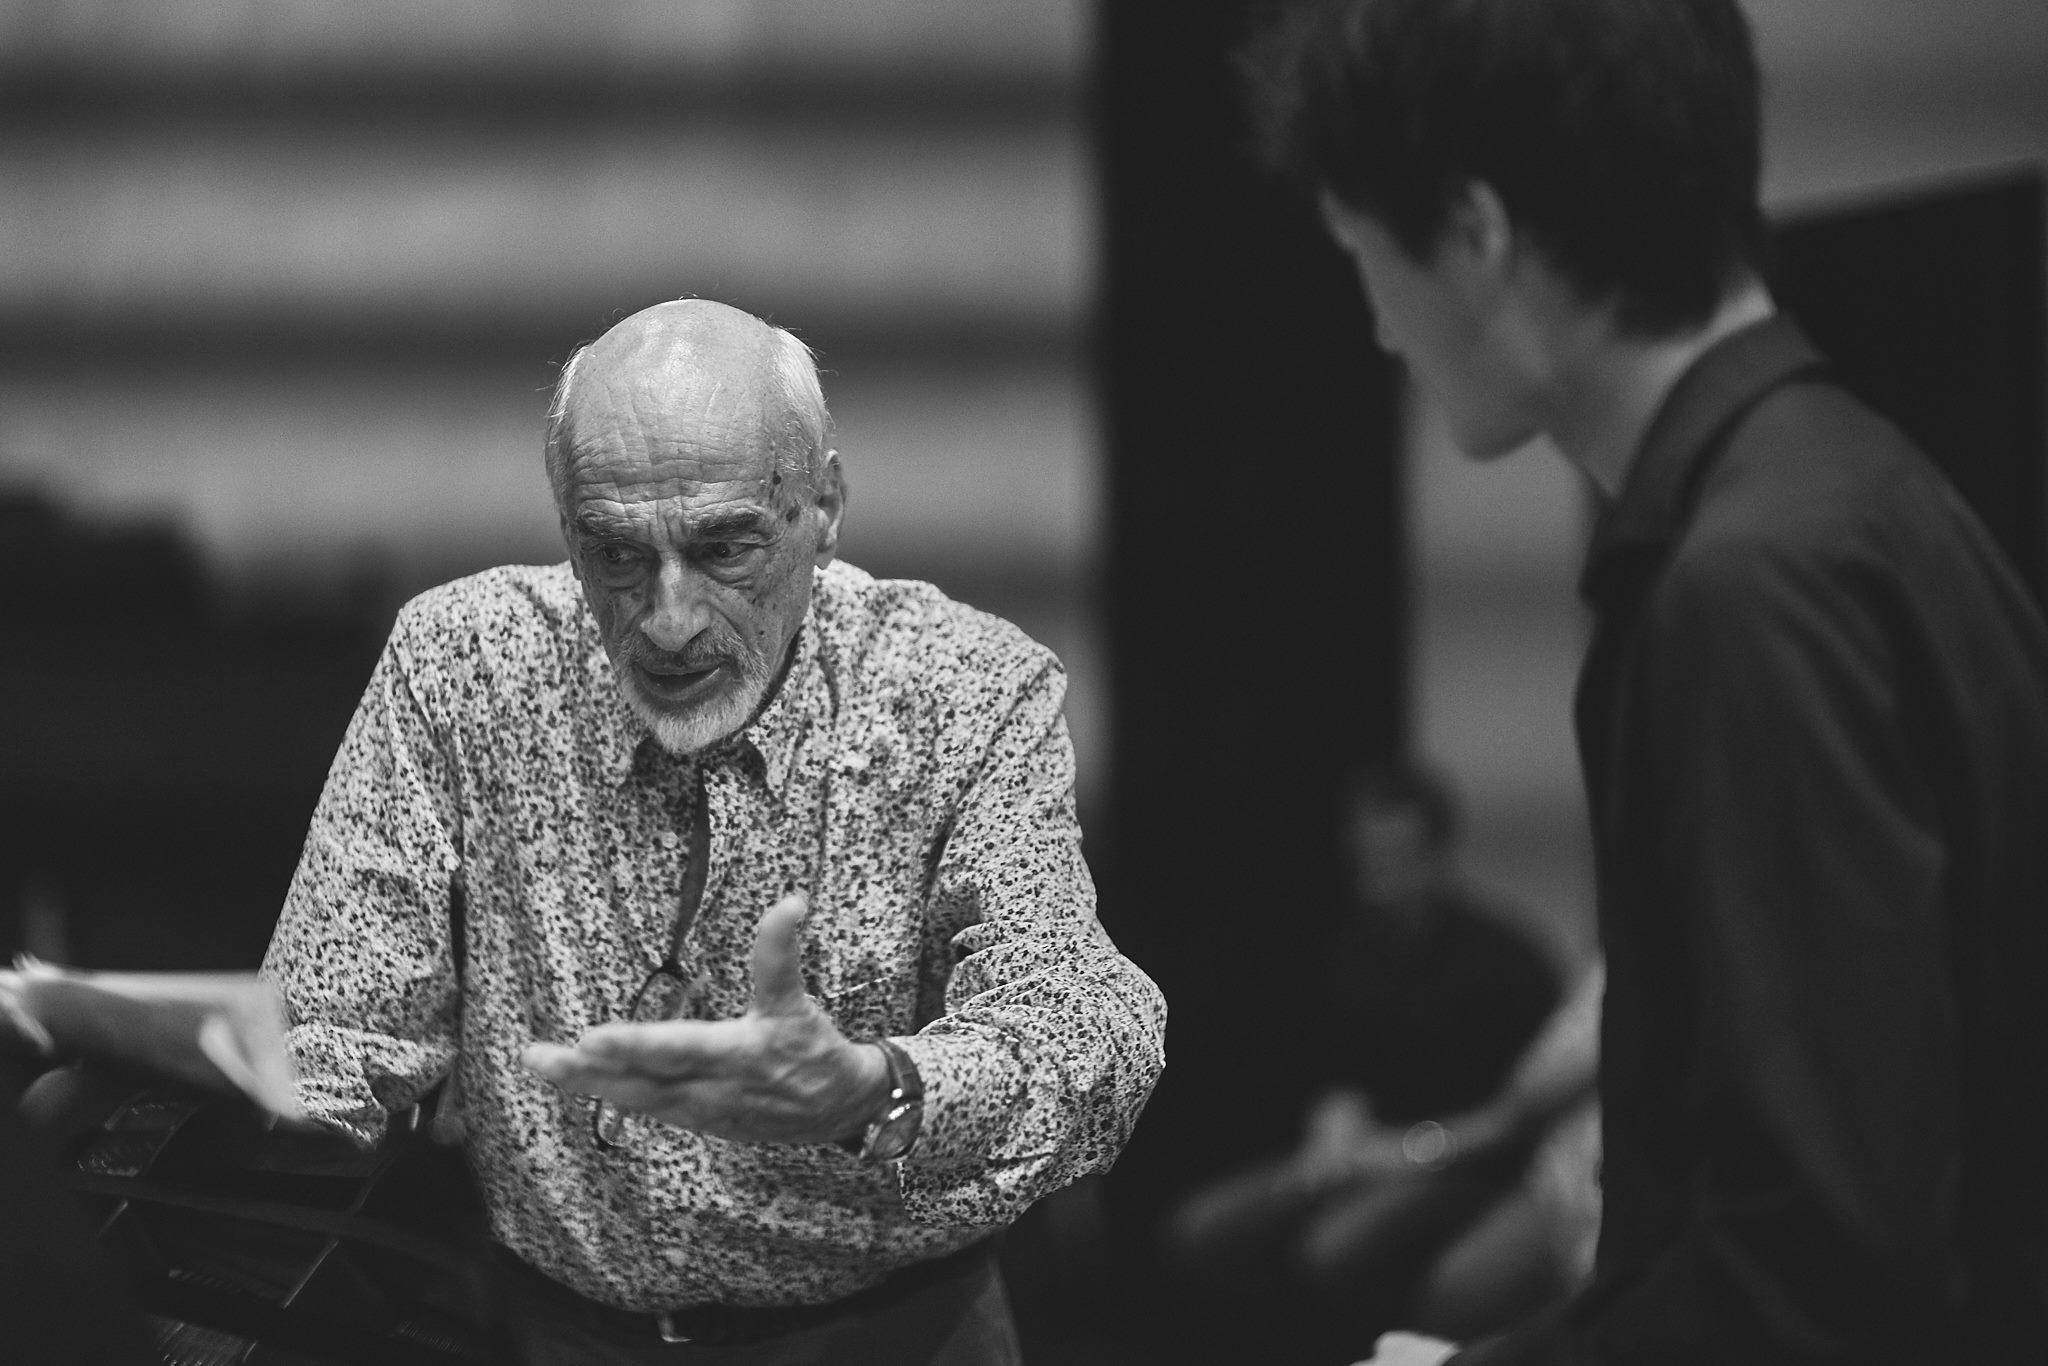 Kirill Gerstein: What I learned from Bashkirov